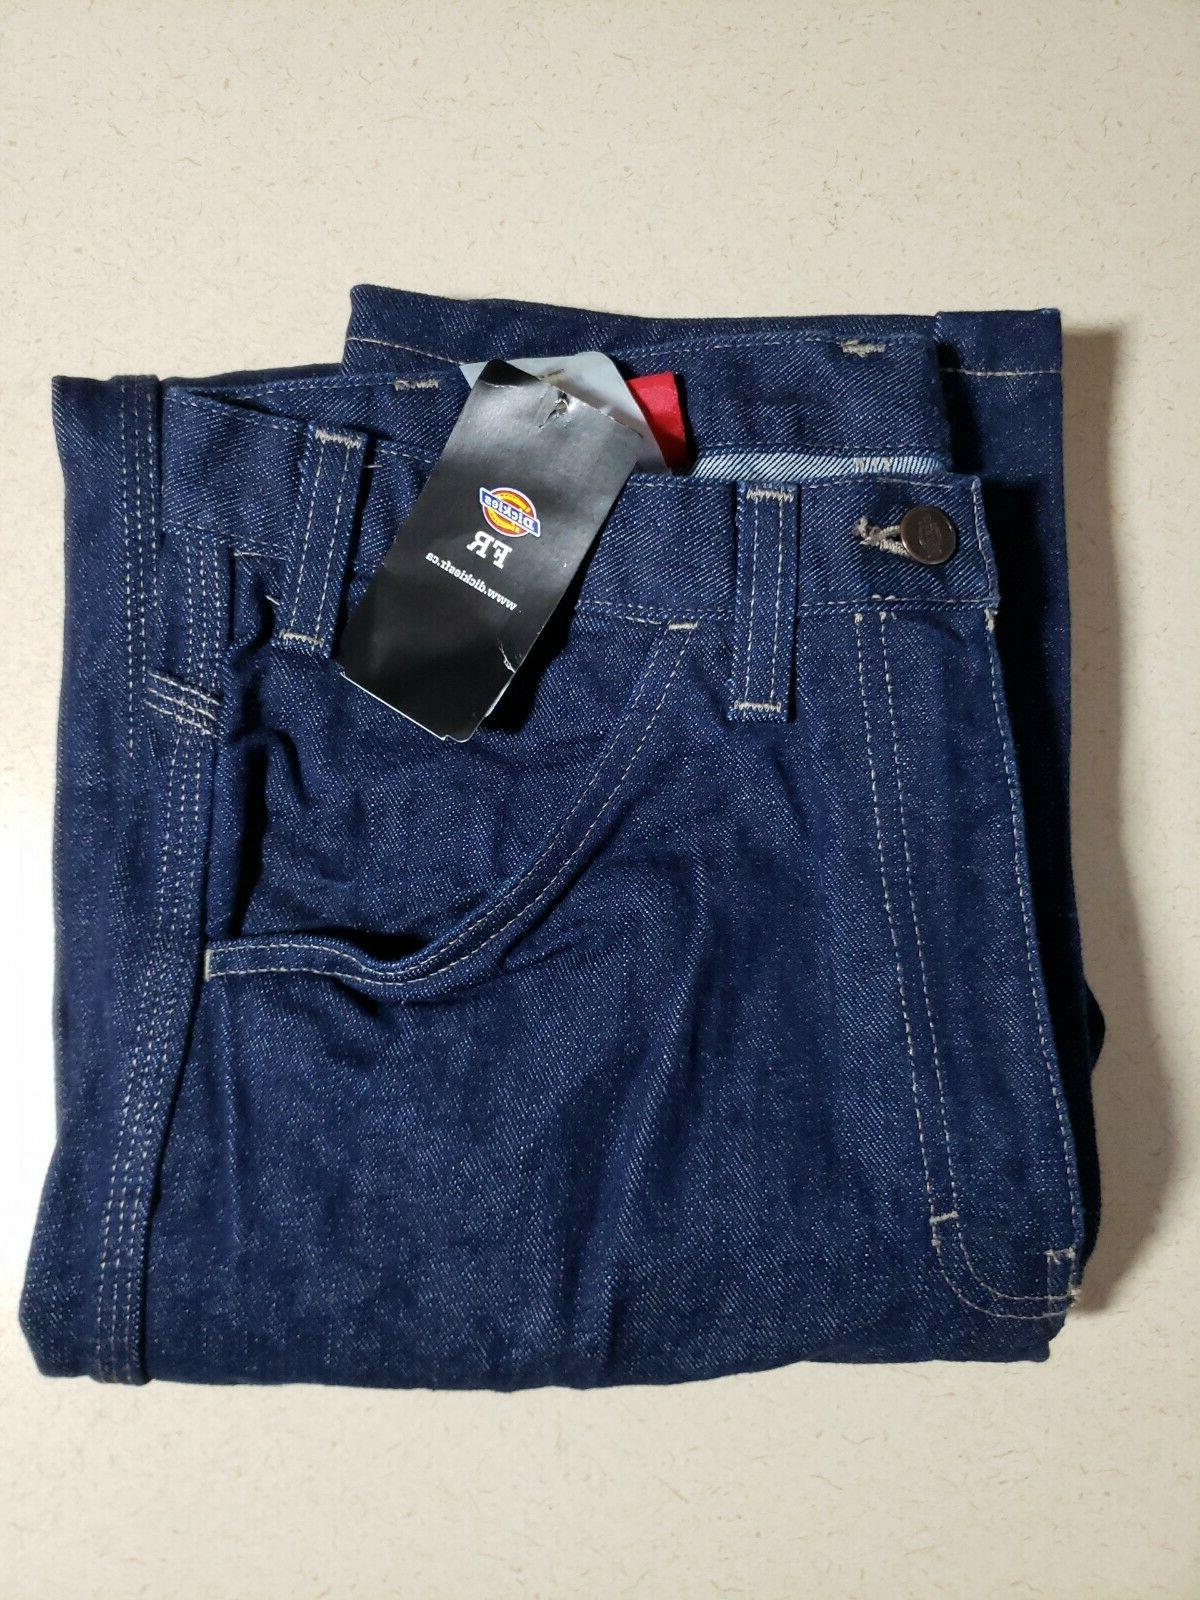 Dickies Men's Jeans Workwear Size 32 34 See Description